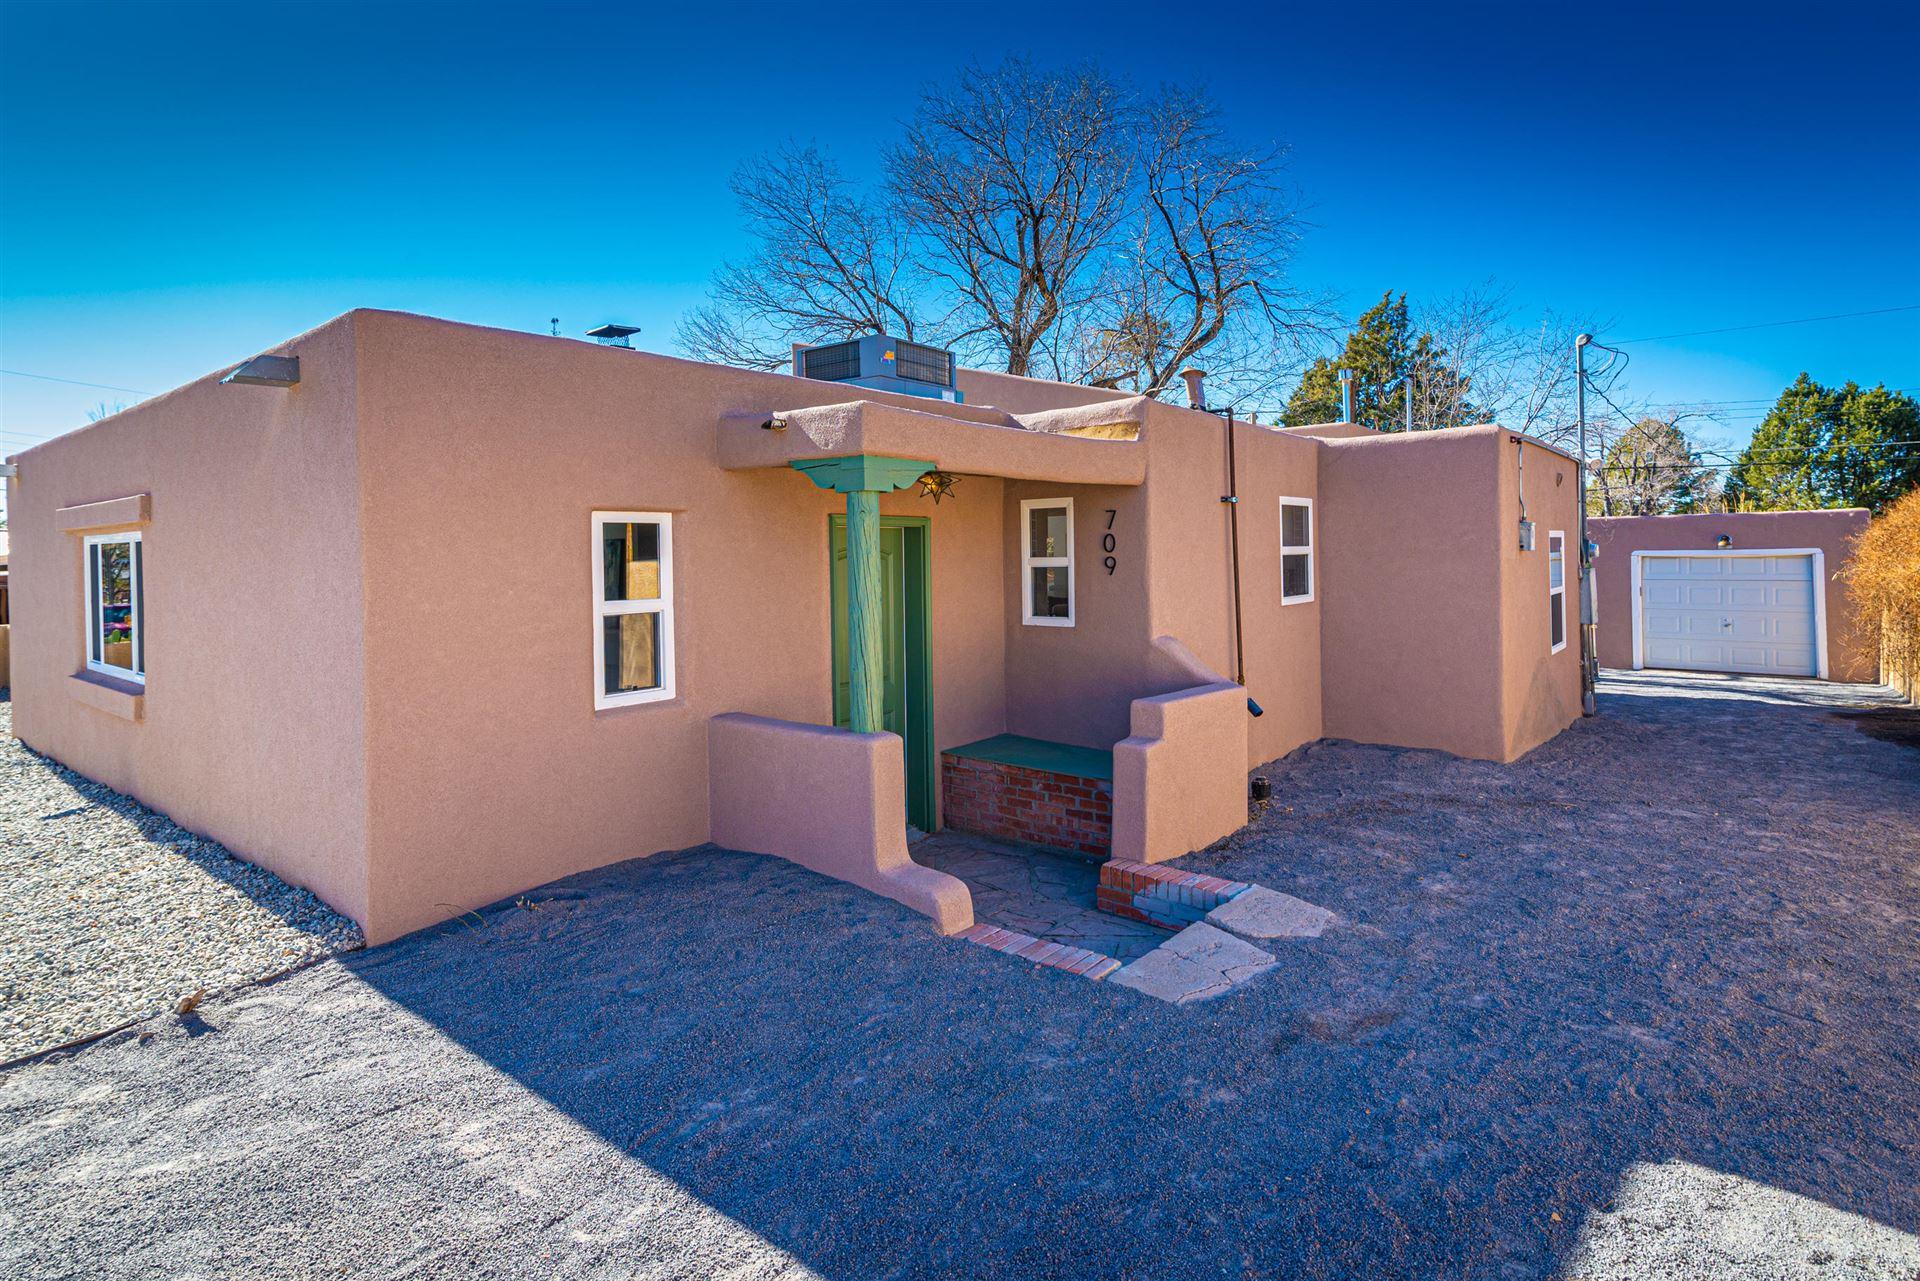 709 JEFFERSON Street NE, Albuquerque, NM 87110 - MLS#: 989451